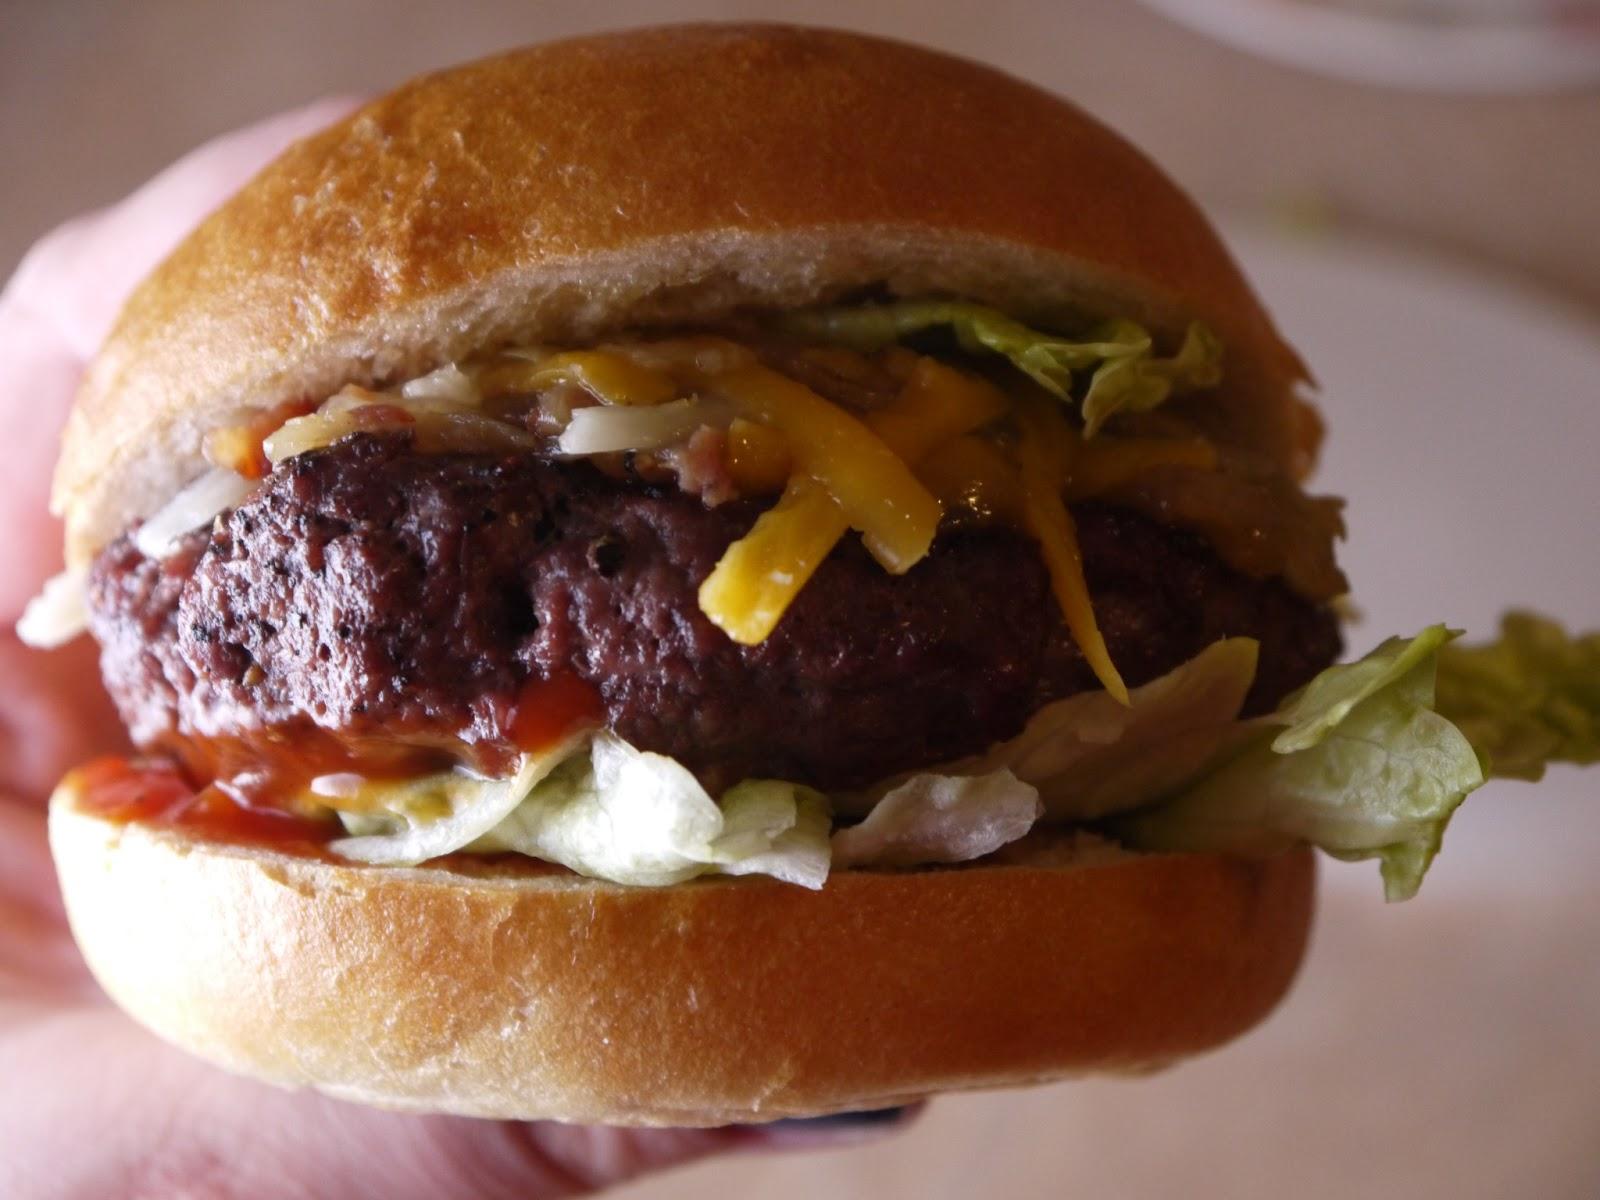 buffalo+burger+large.JPG